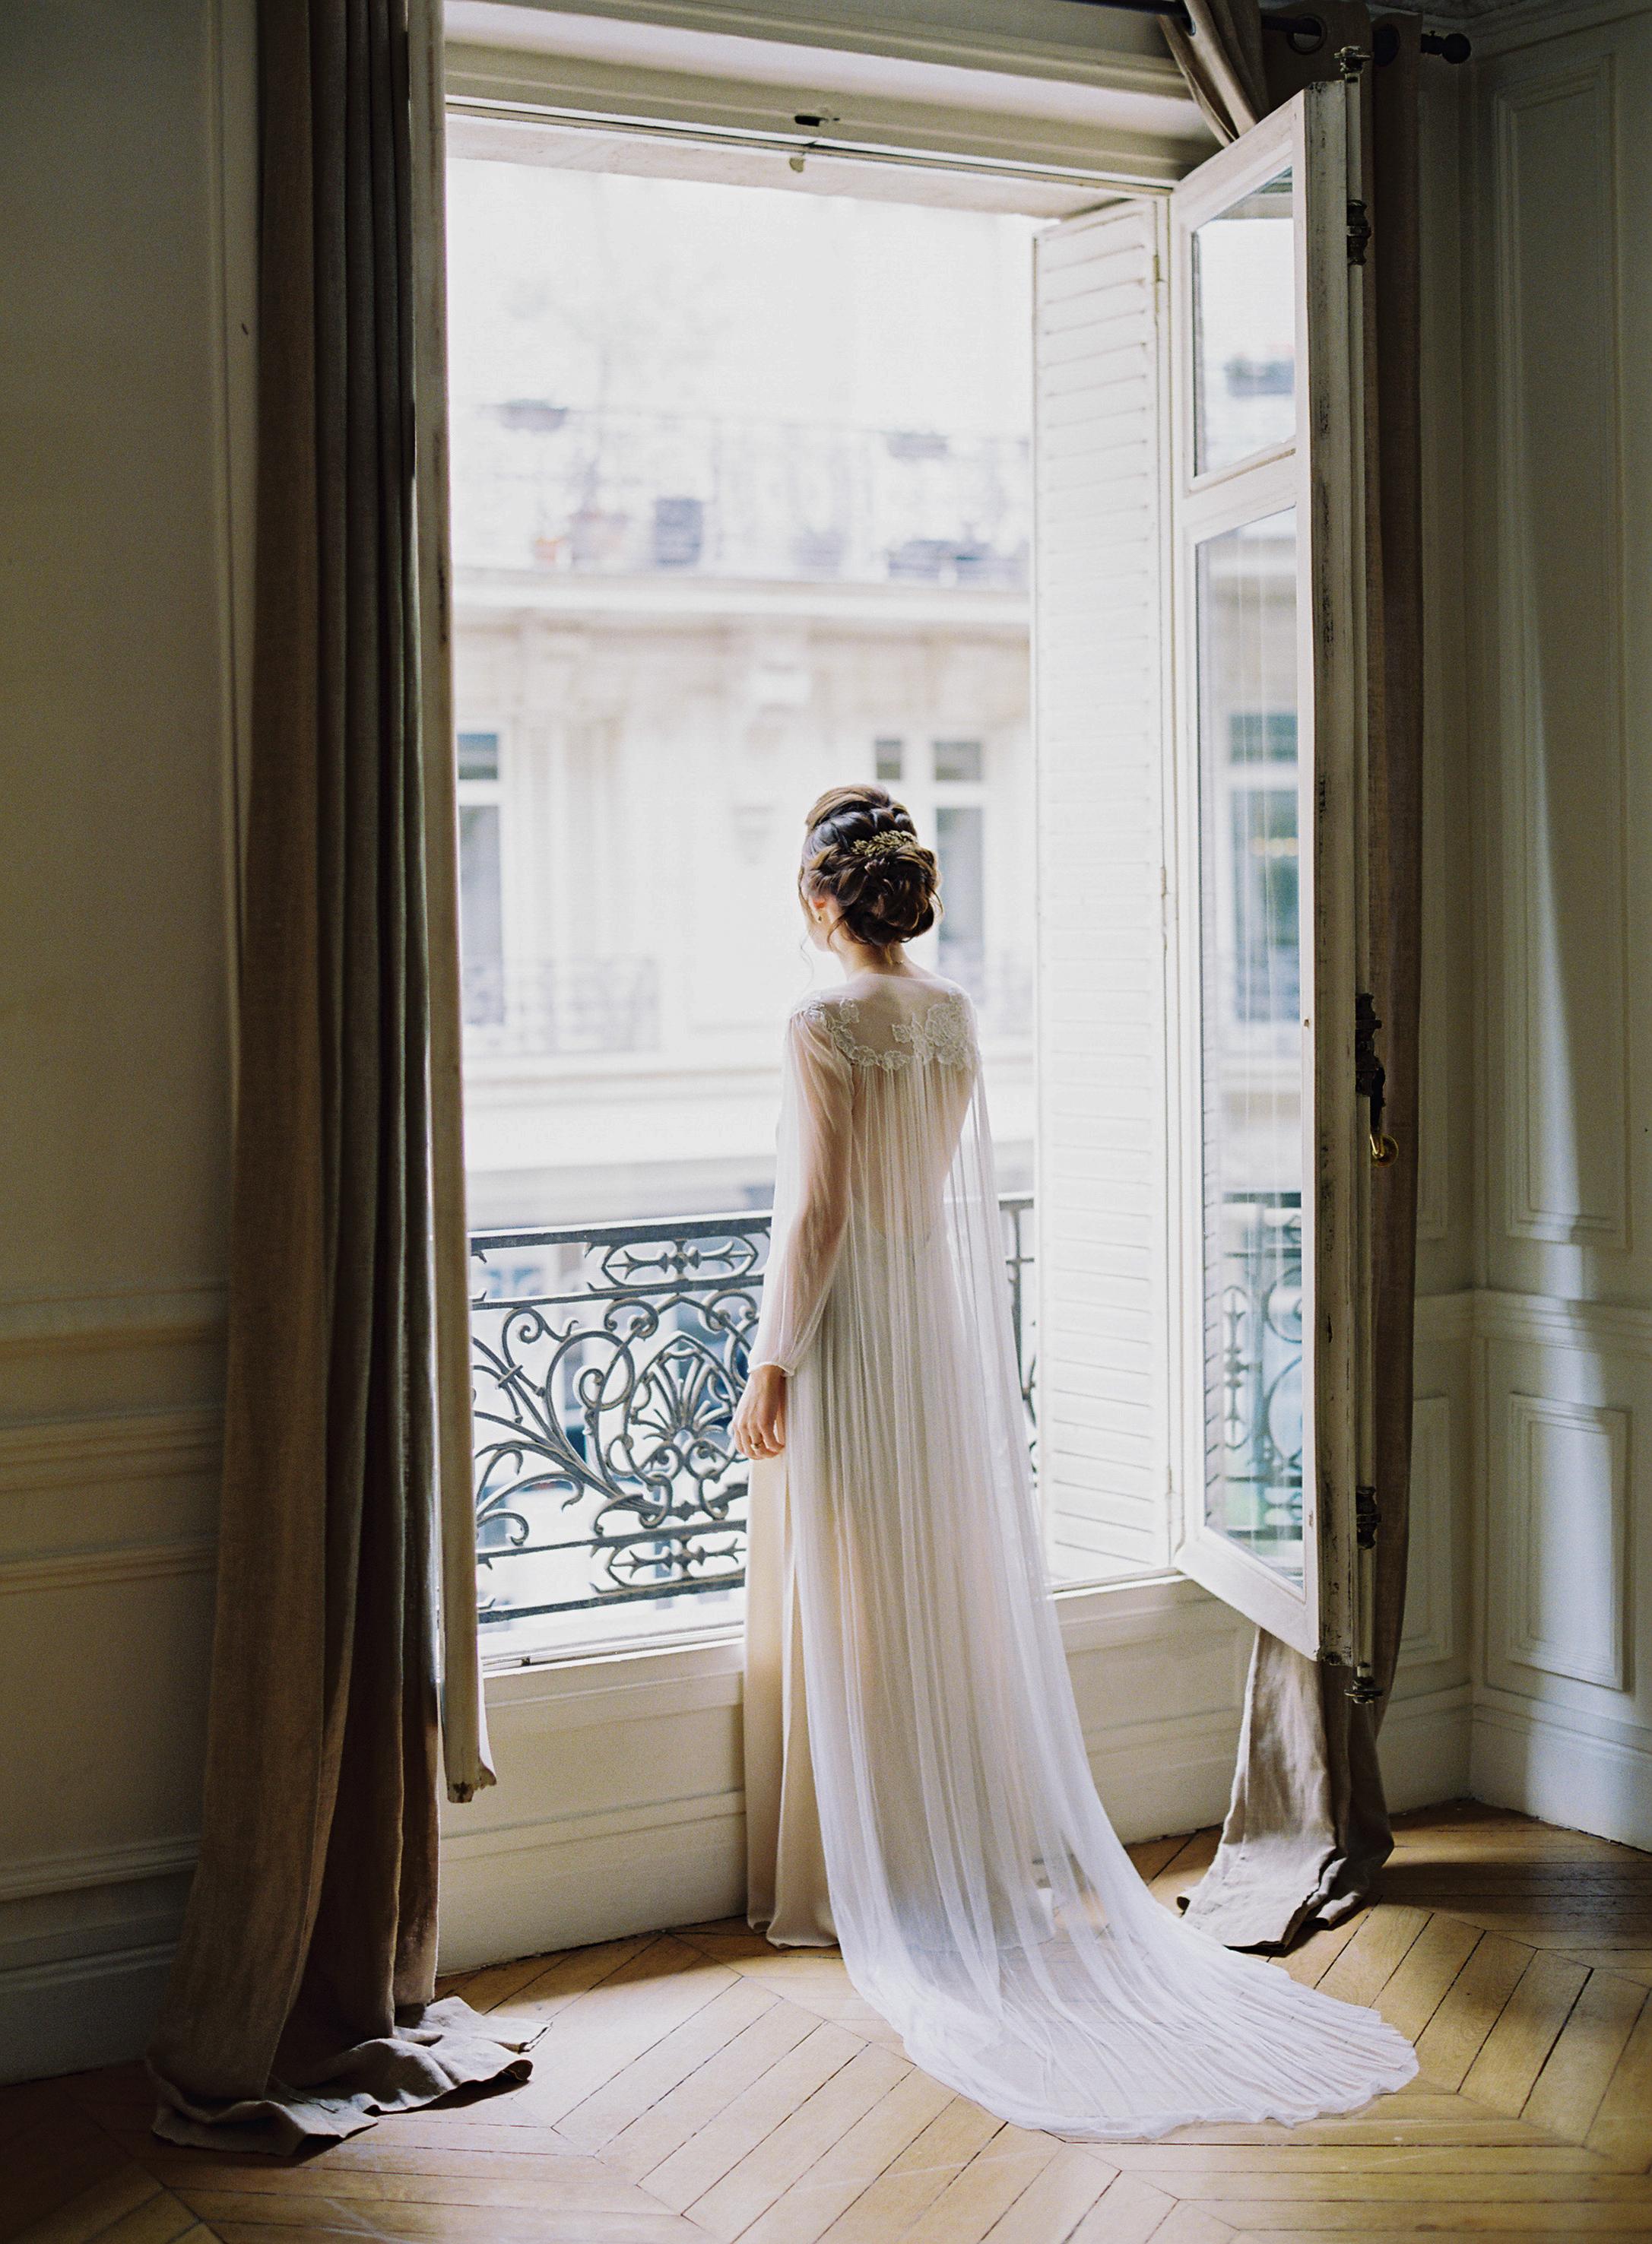 Paris-France-Film-Wedding-Carrie King Photographer-41.jpg